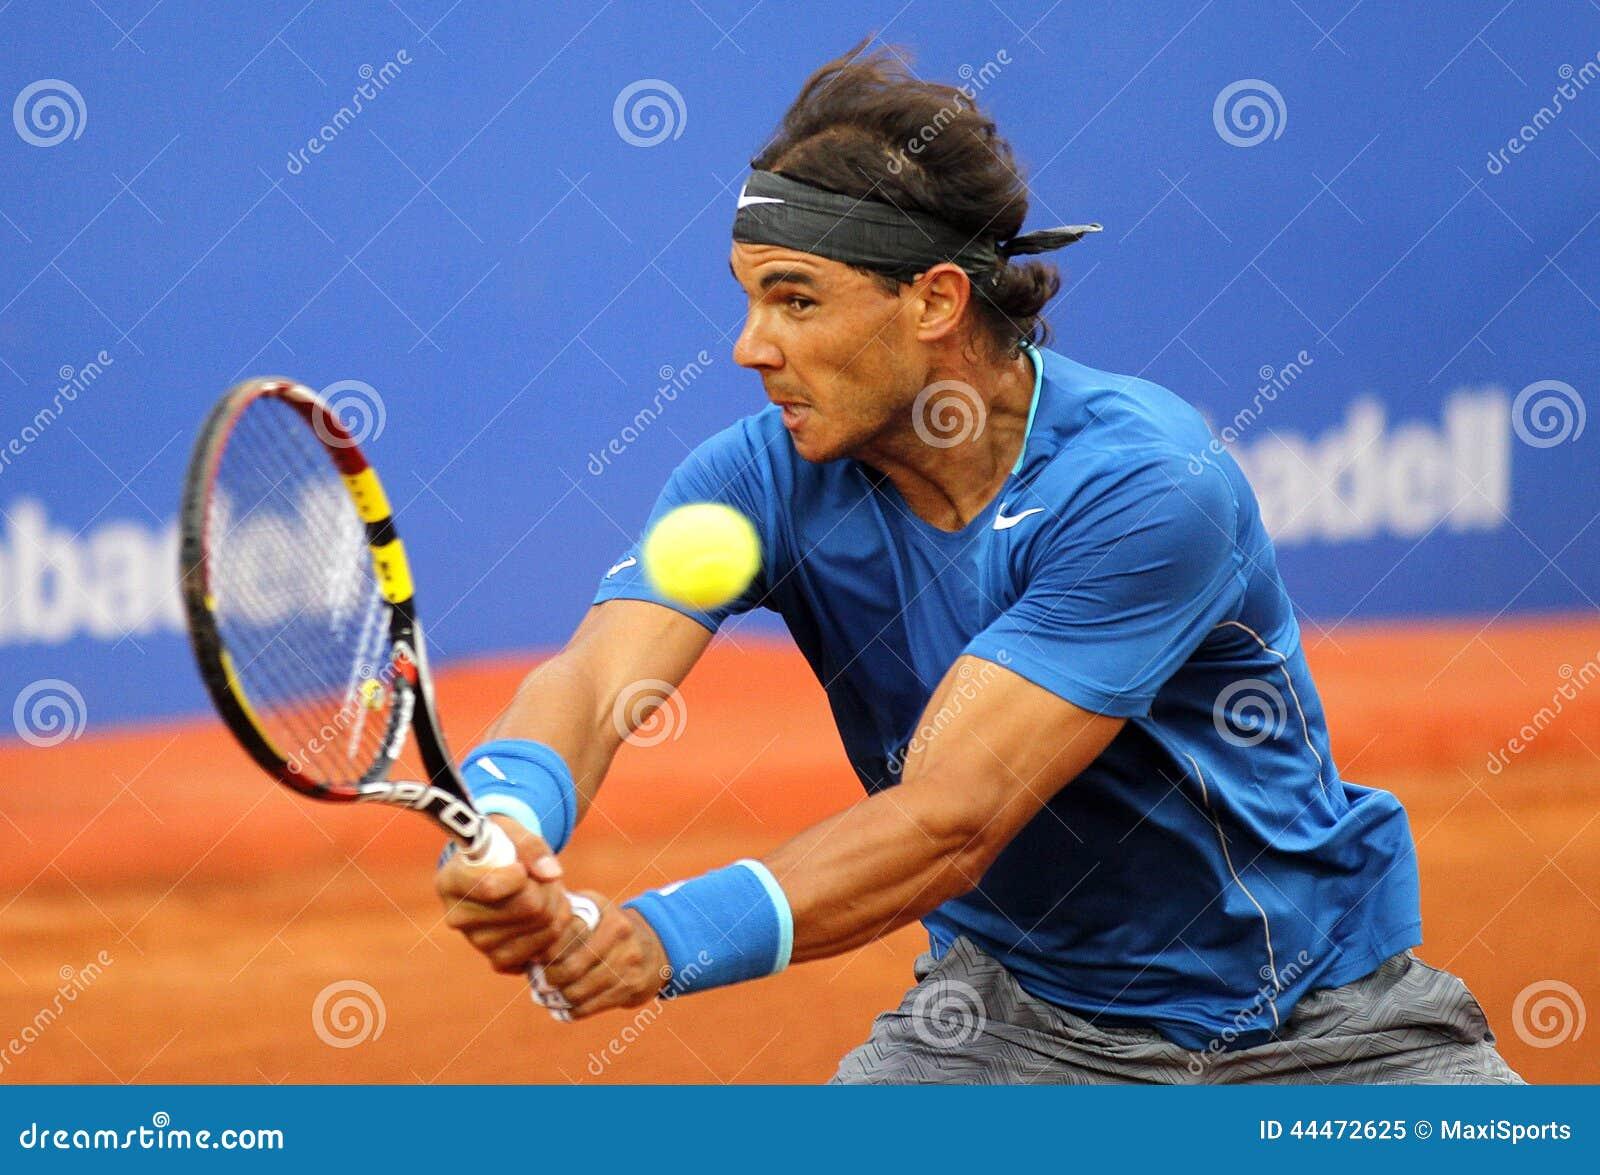 Jugador de tenis español Rafa Nadal